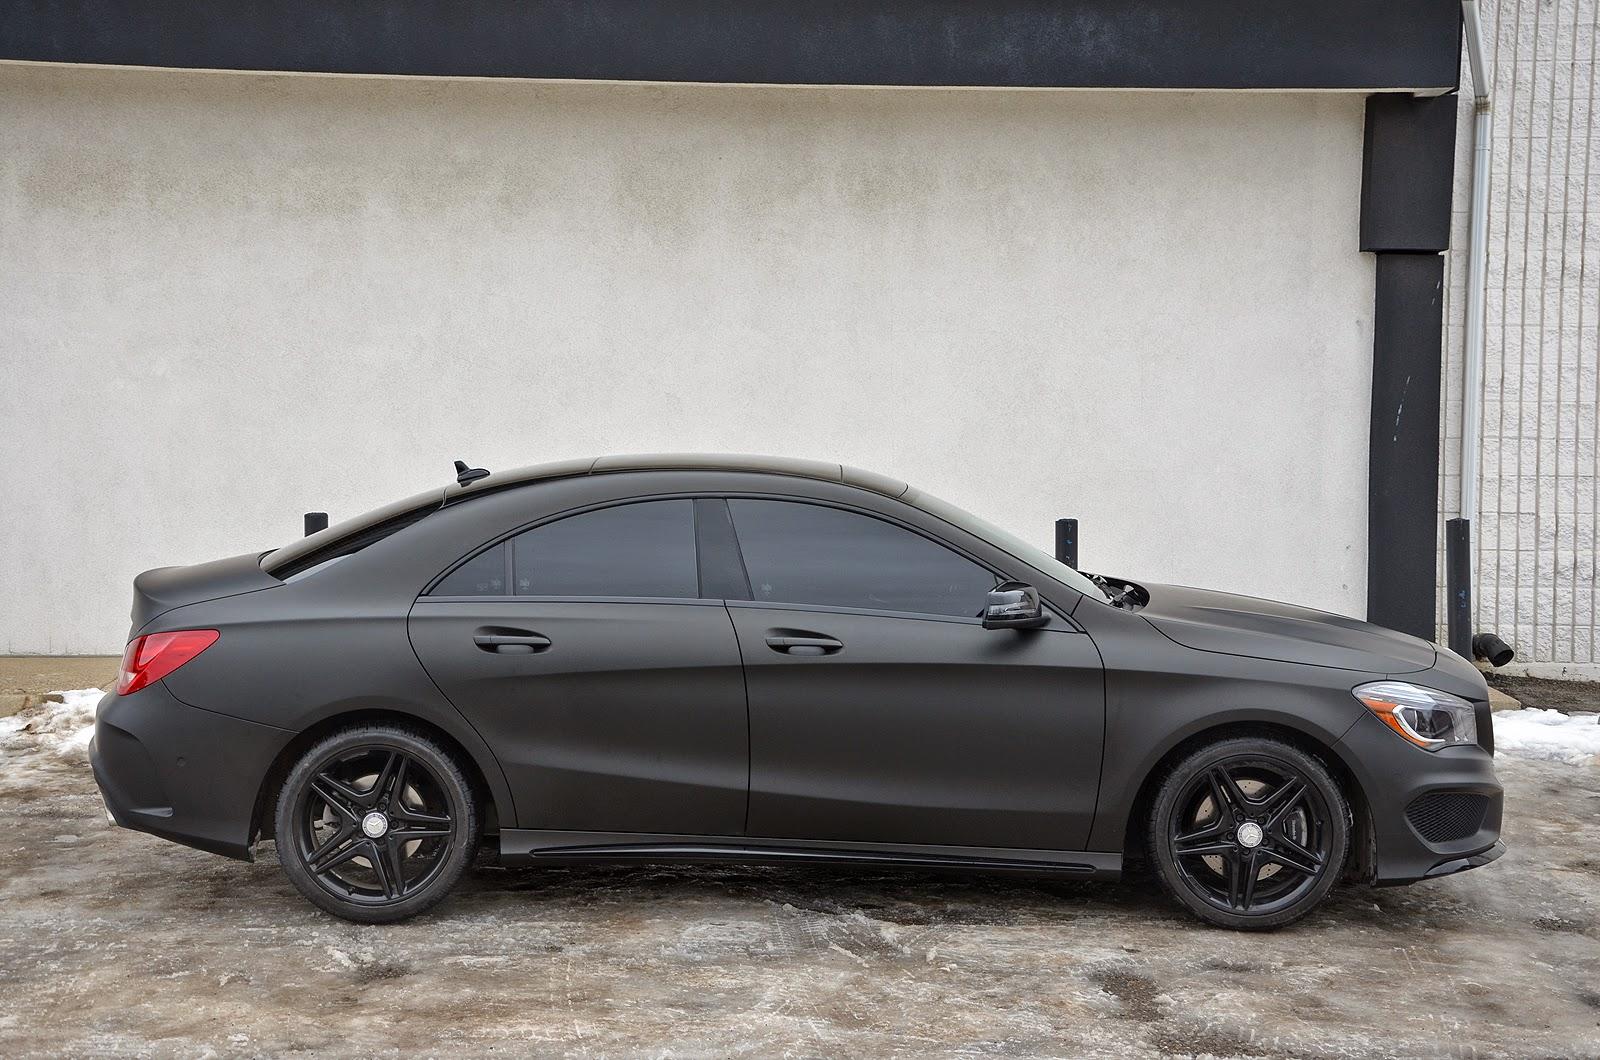 Zr auto blog sinister matte black wrapped mercedes cla for Mercedes benz matte black